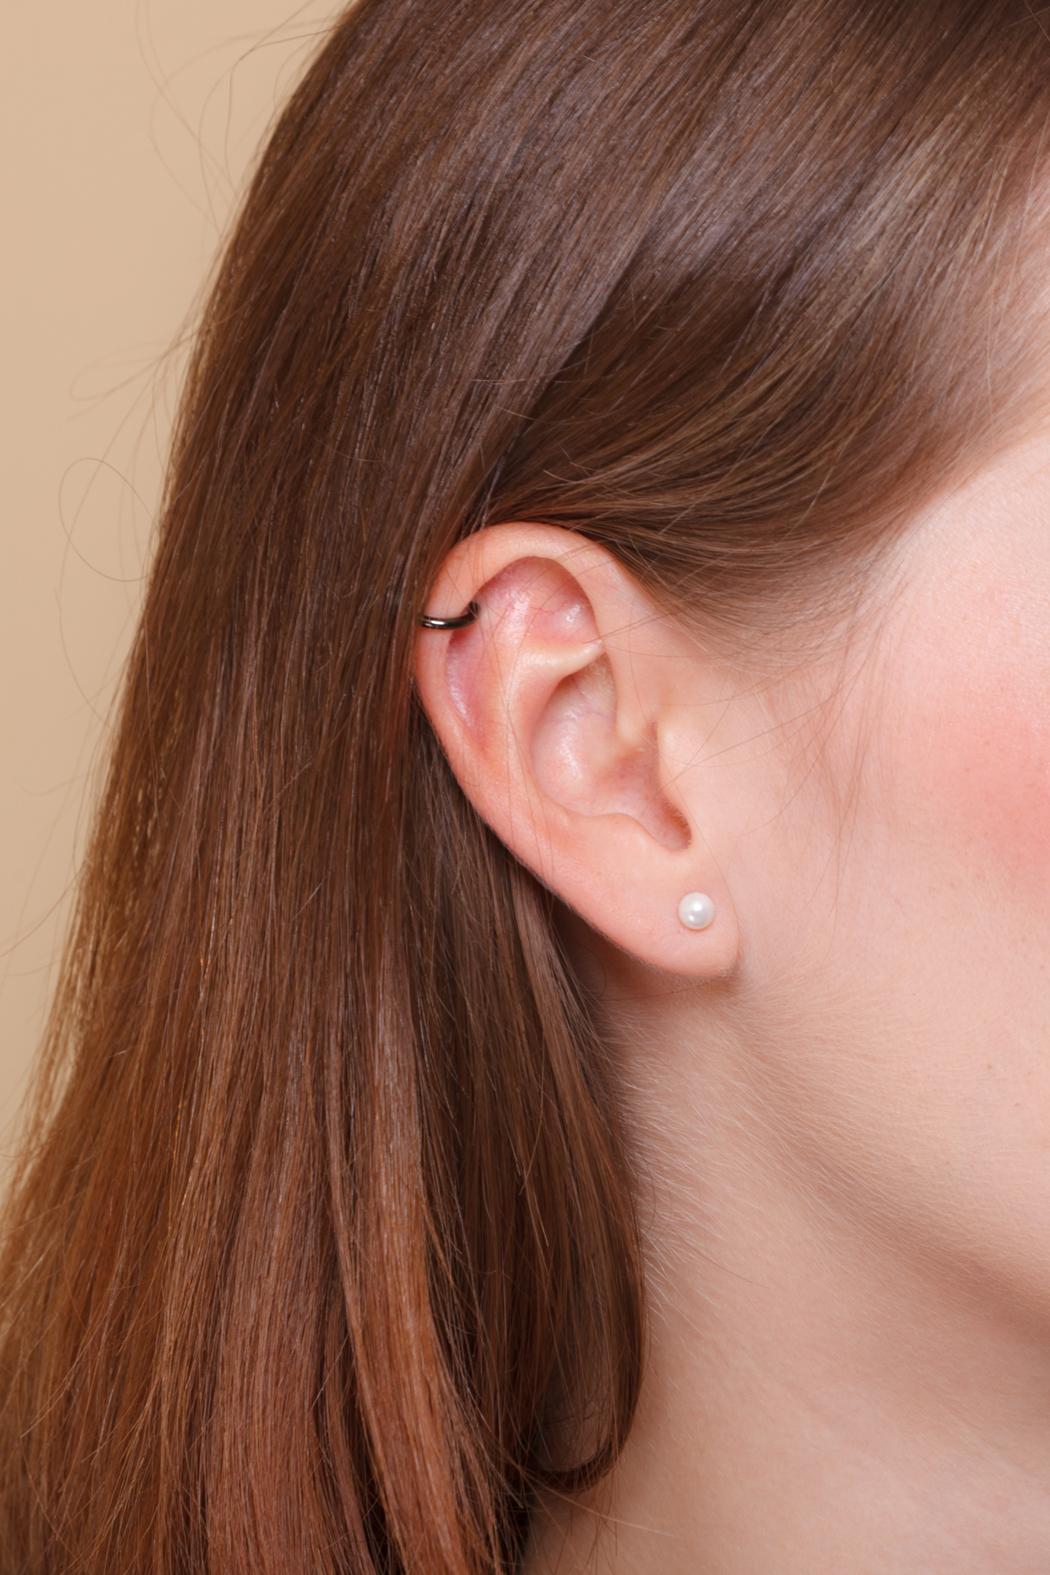 piercing helix oreille conseils